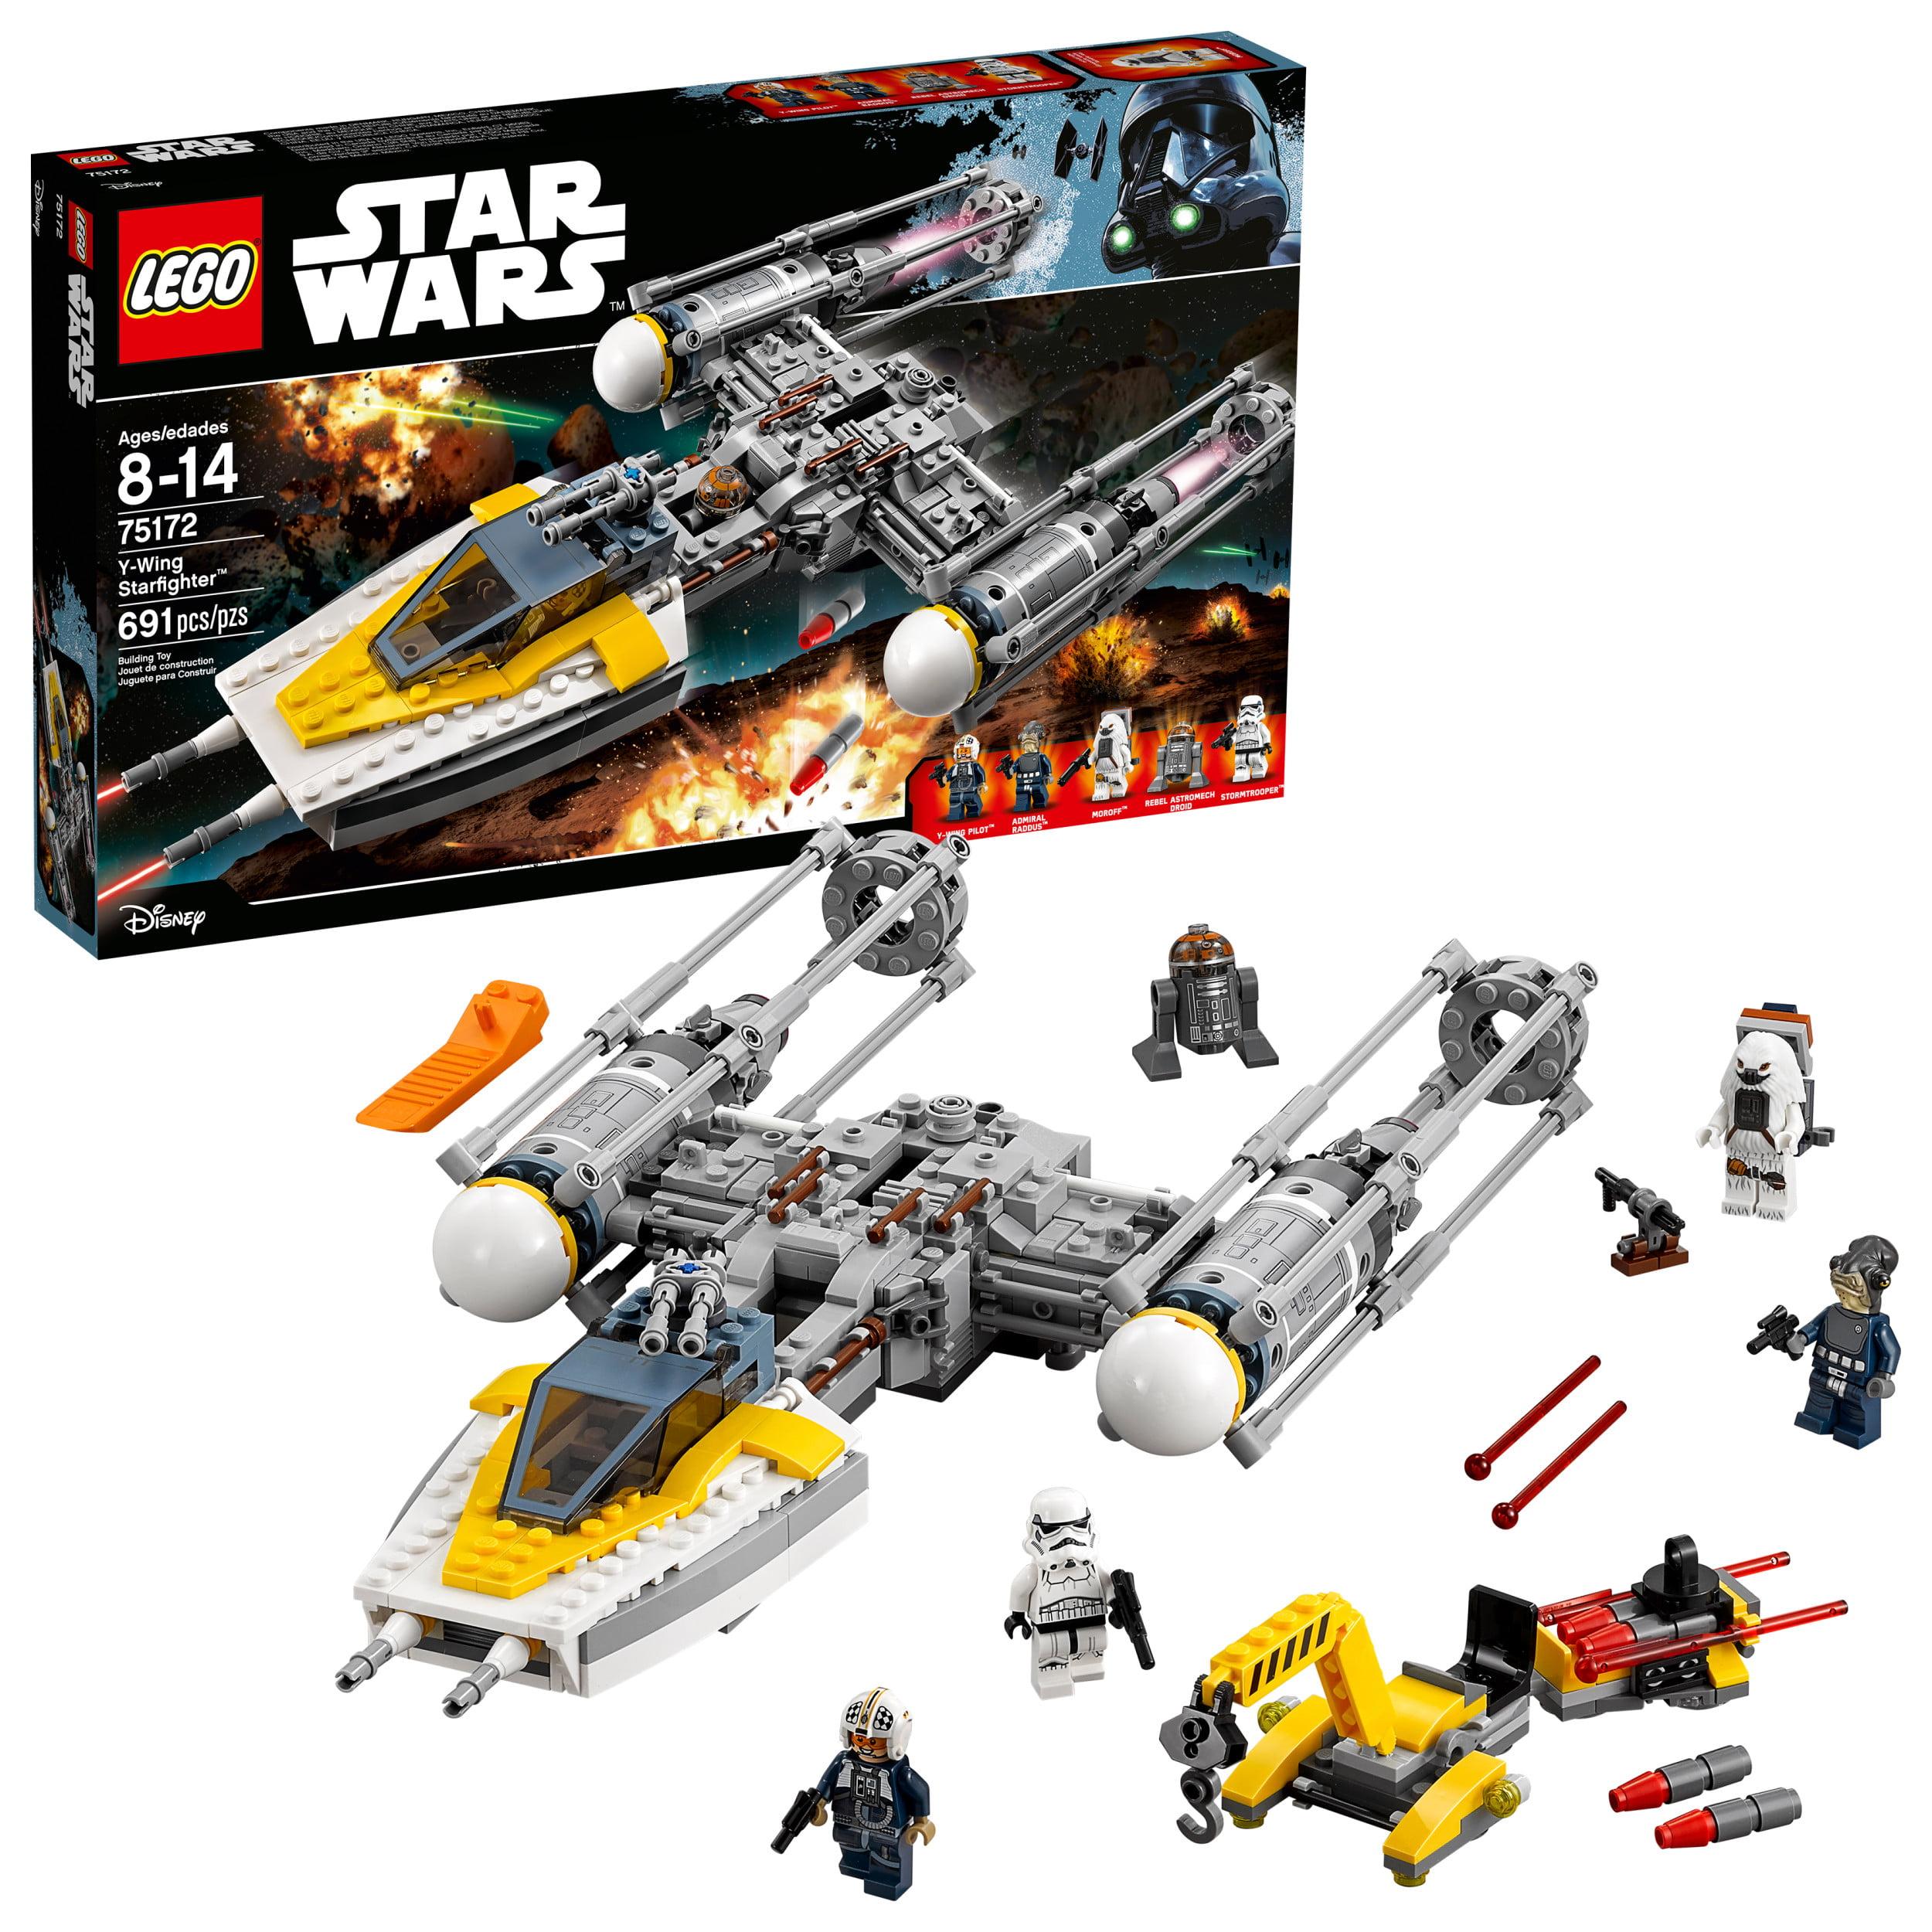 LEGO Star Wars TM Y-Wing Starfighter 75172